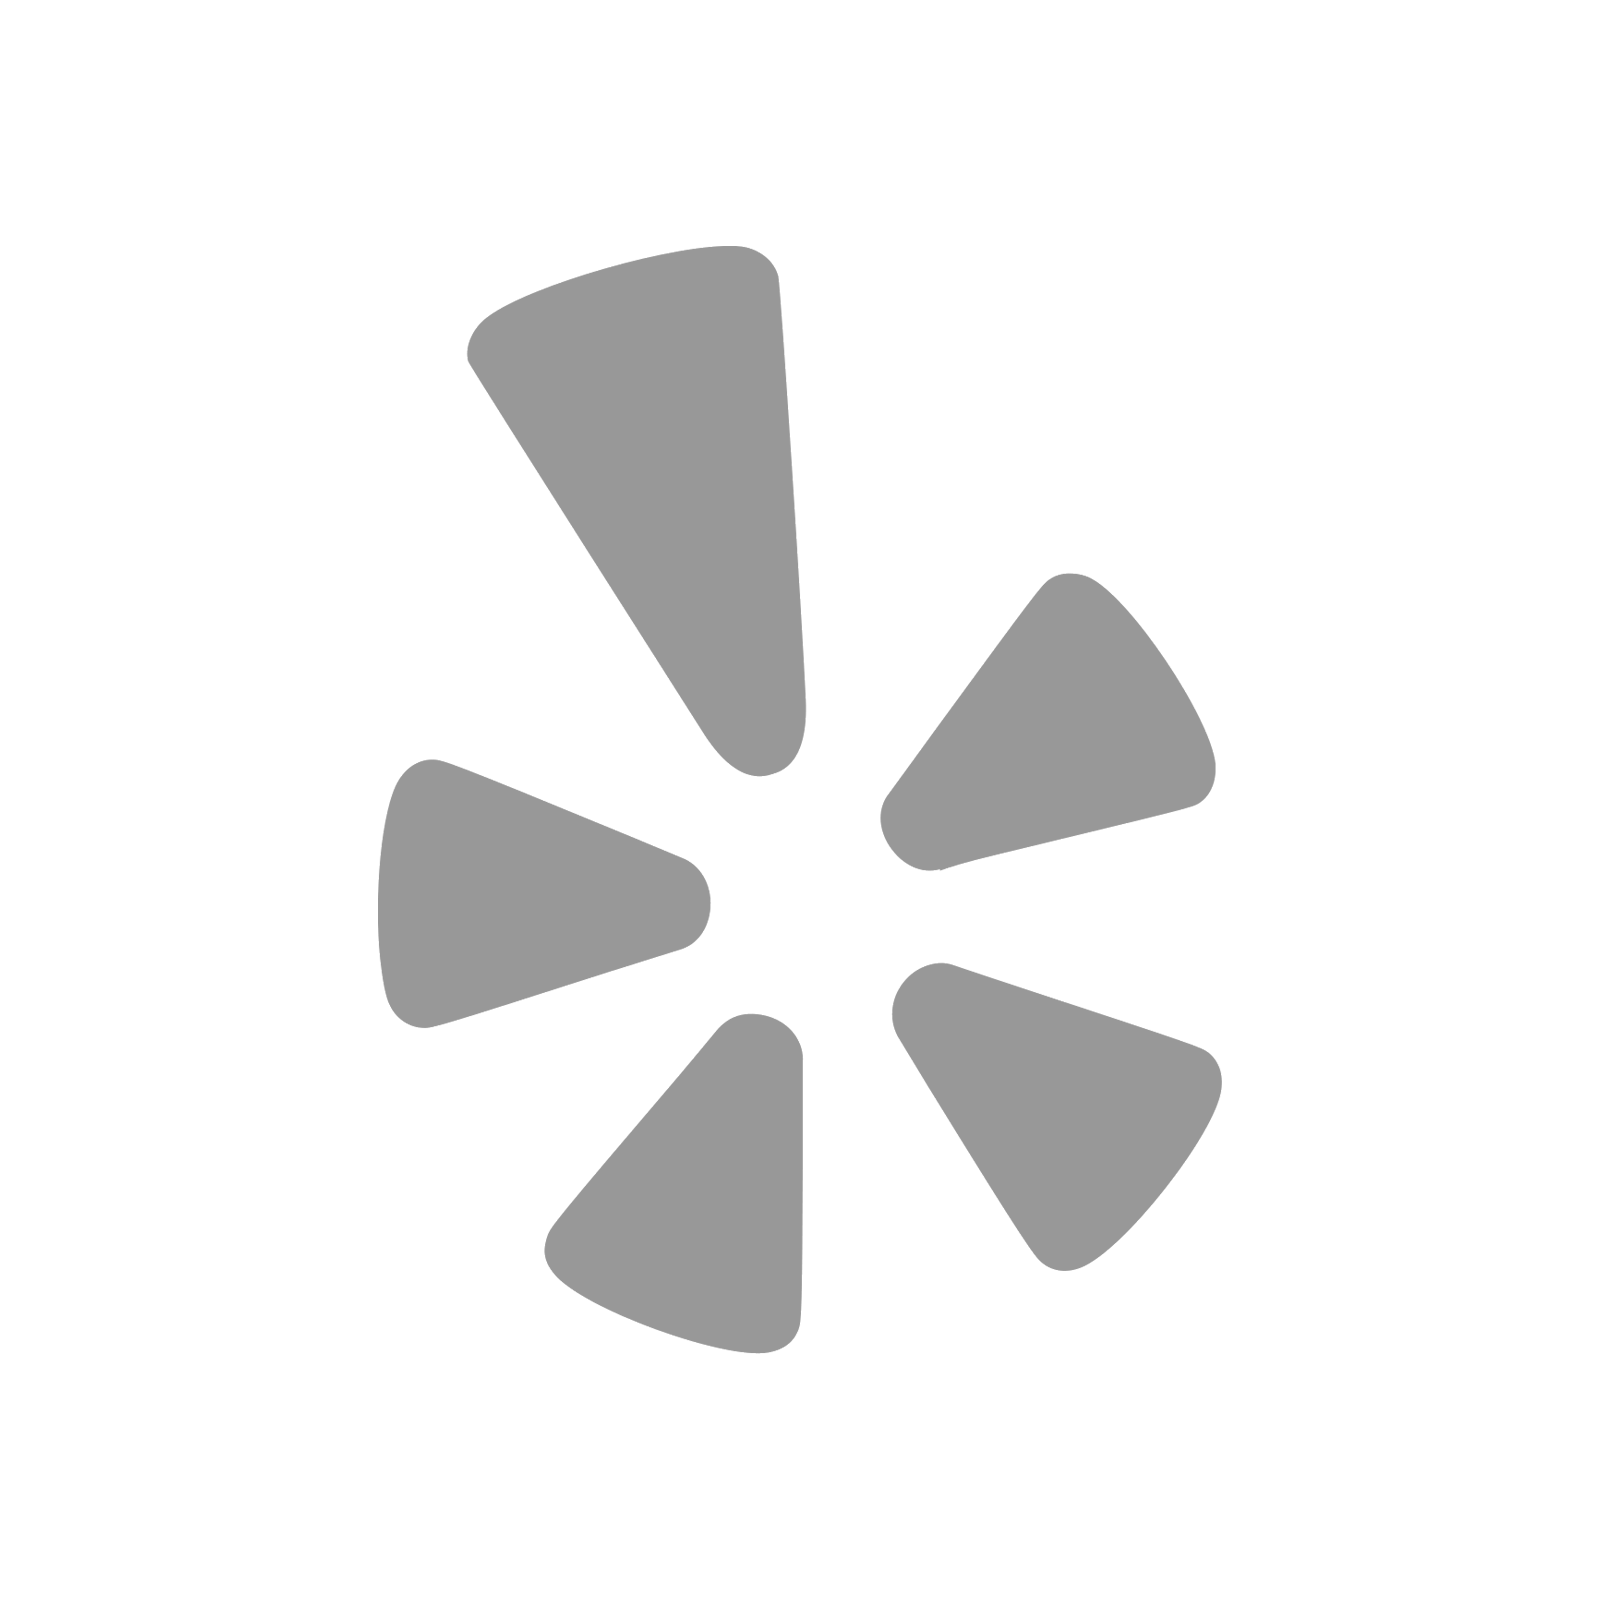 https://i2.wp.com/maukamakai.madebyscott.com/wp-content/uploads/2018/09/yelp-logo.png?ssl=1